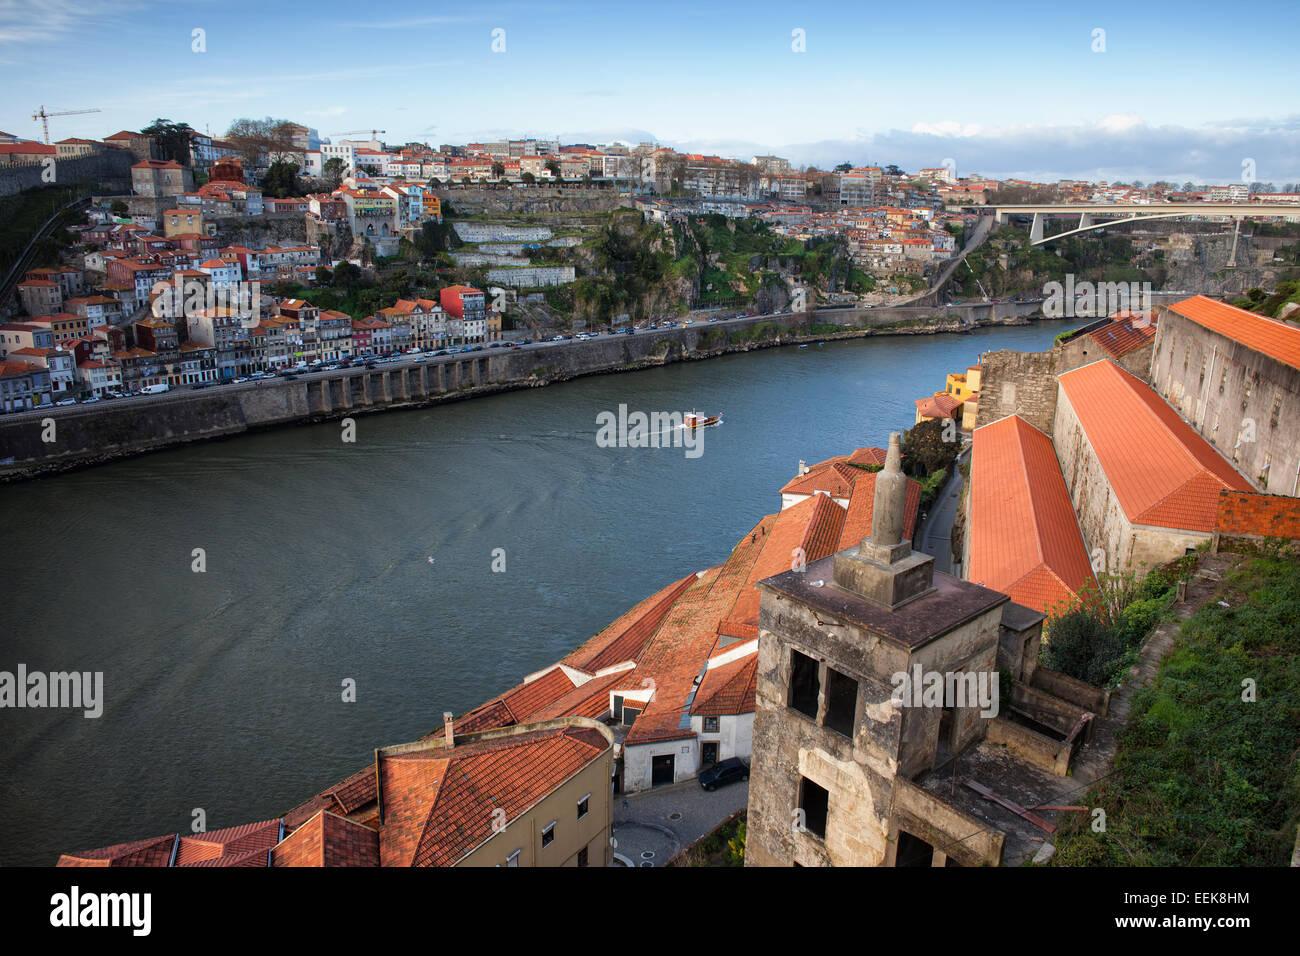 City of Porto in Portugal, on the first plan wine cellar rooftops of Vila Nova de Gaia. - Stock Image